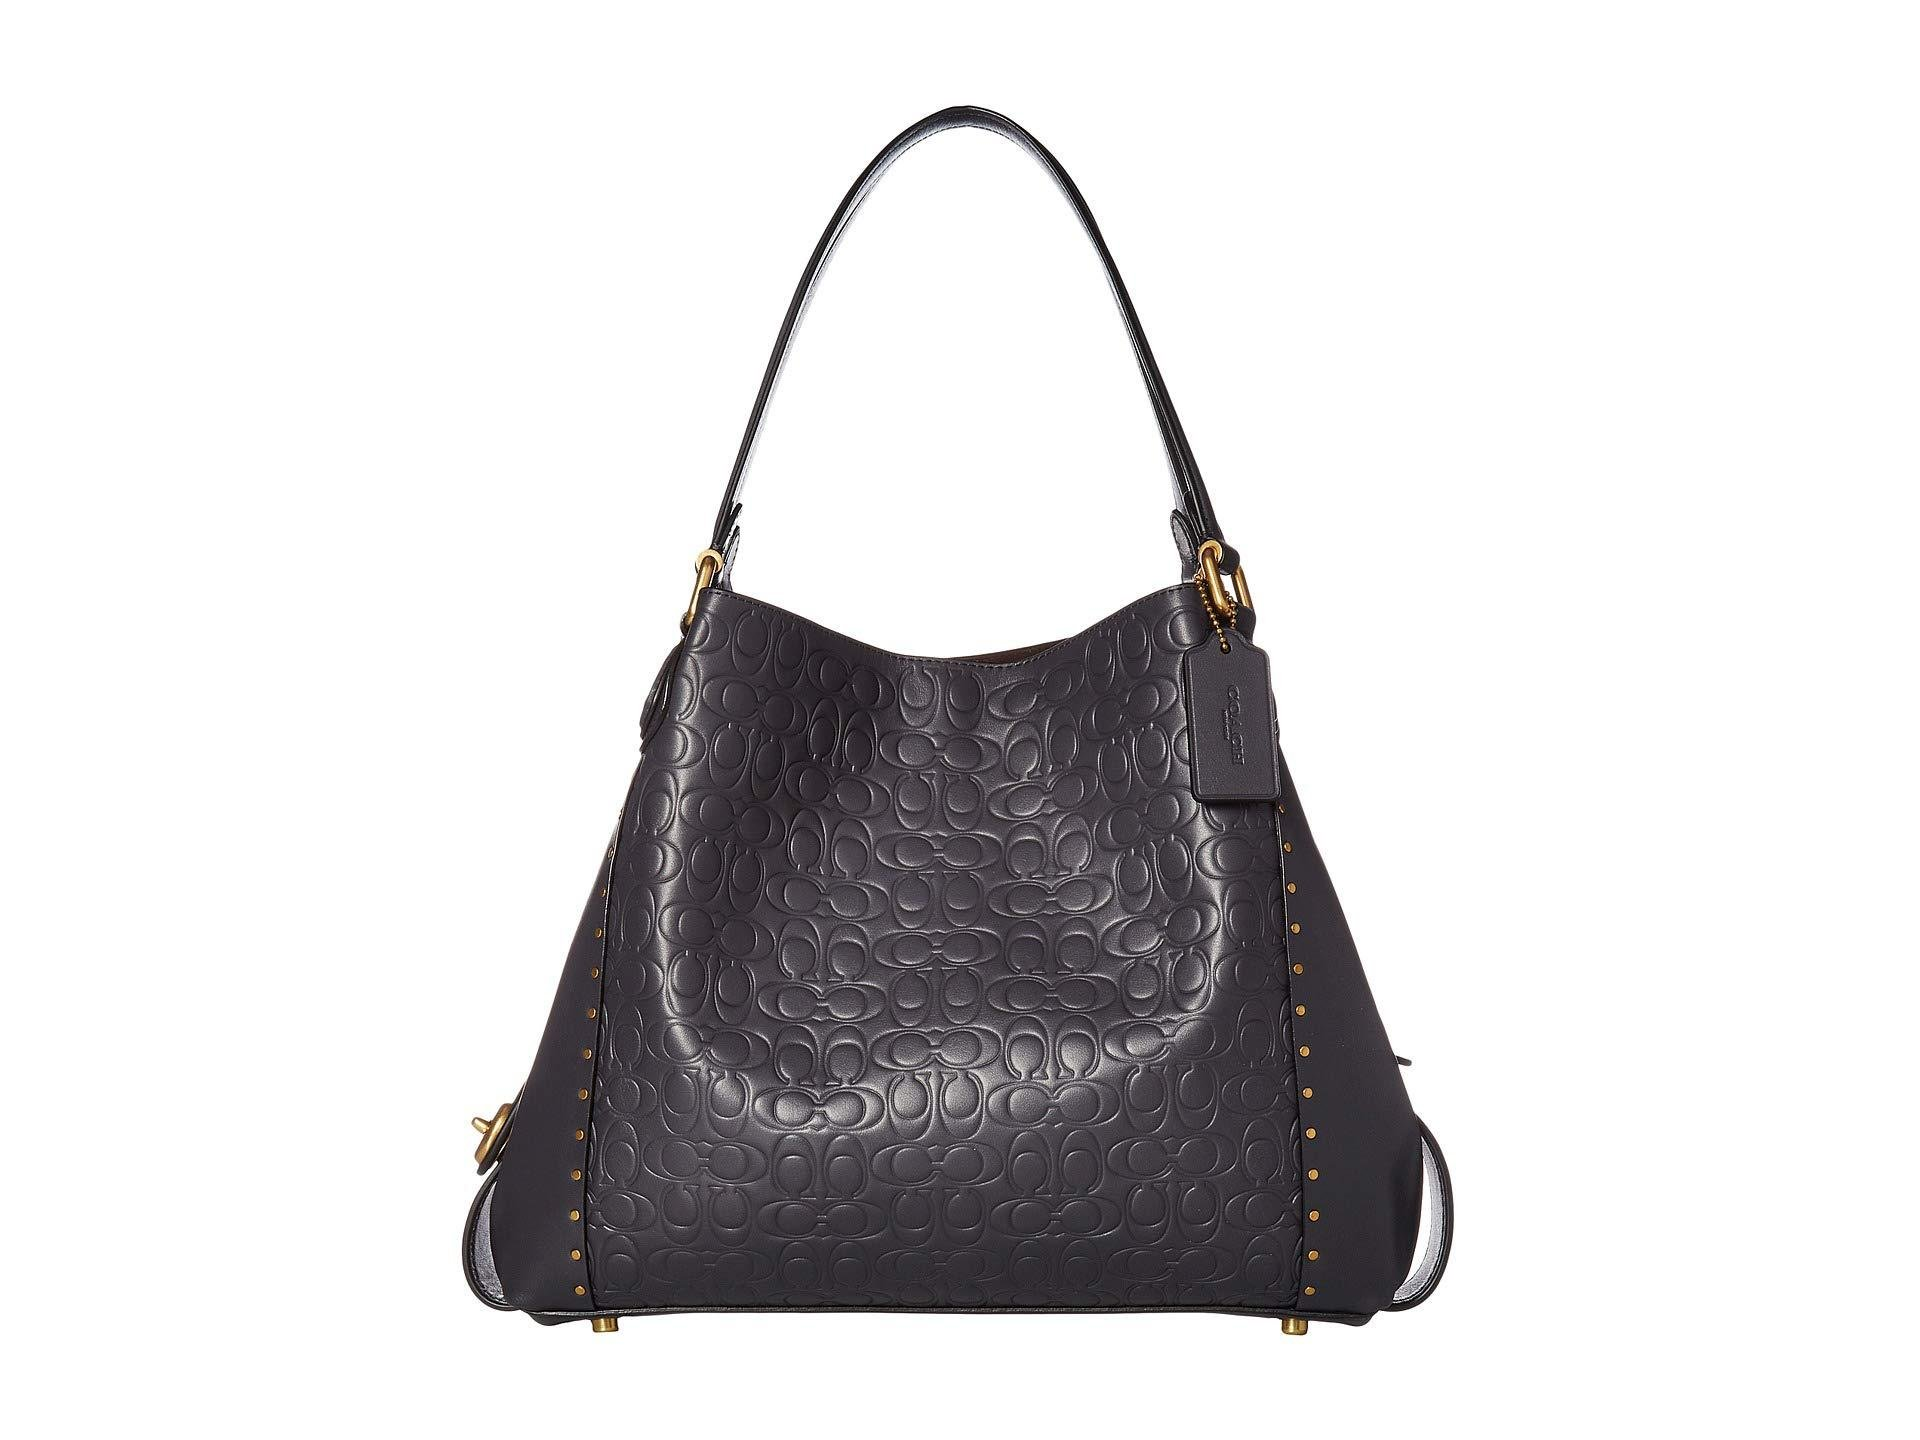 10e7a292bd27 Lyst - COACH Edie 31 Shoulder Bag In Signature Leather (b4 midnight ...